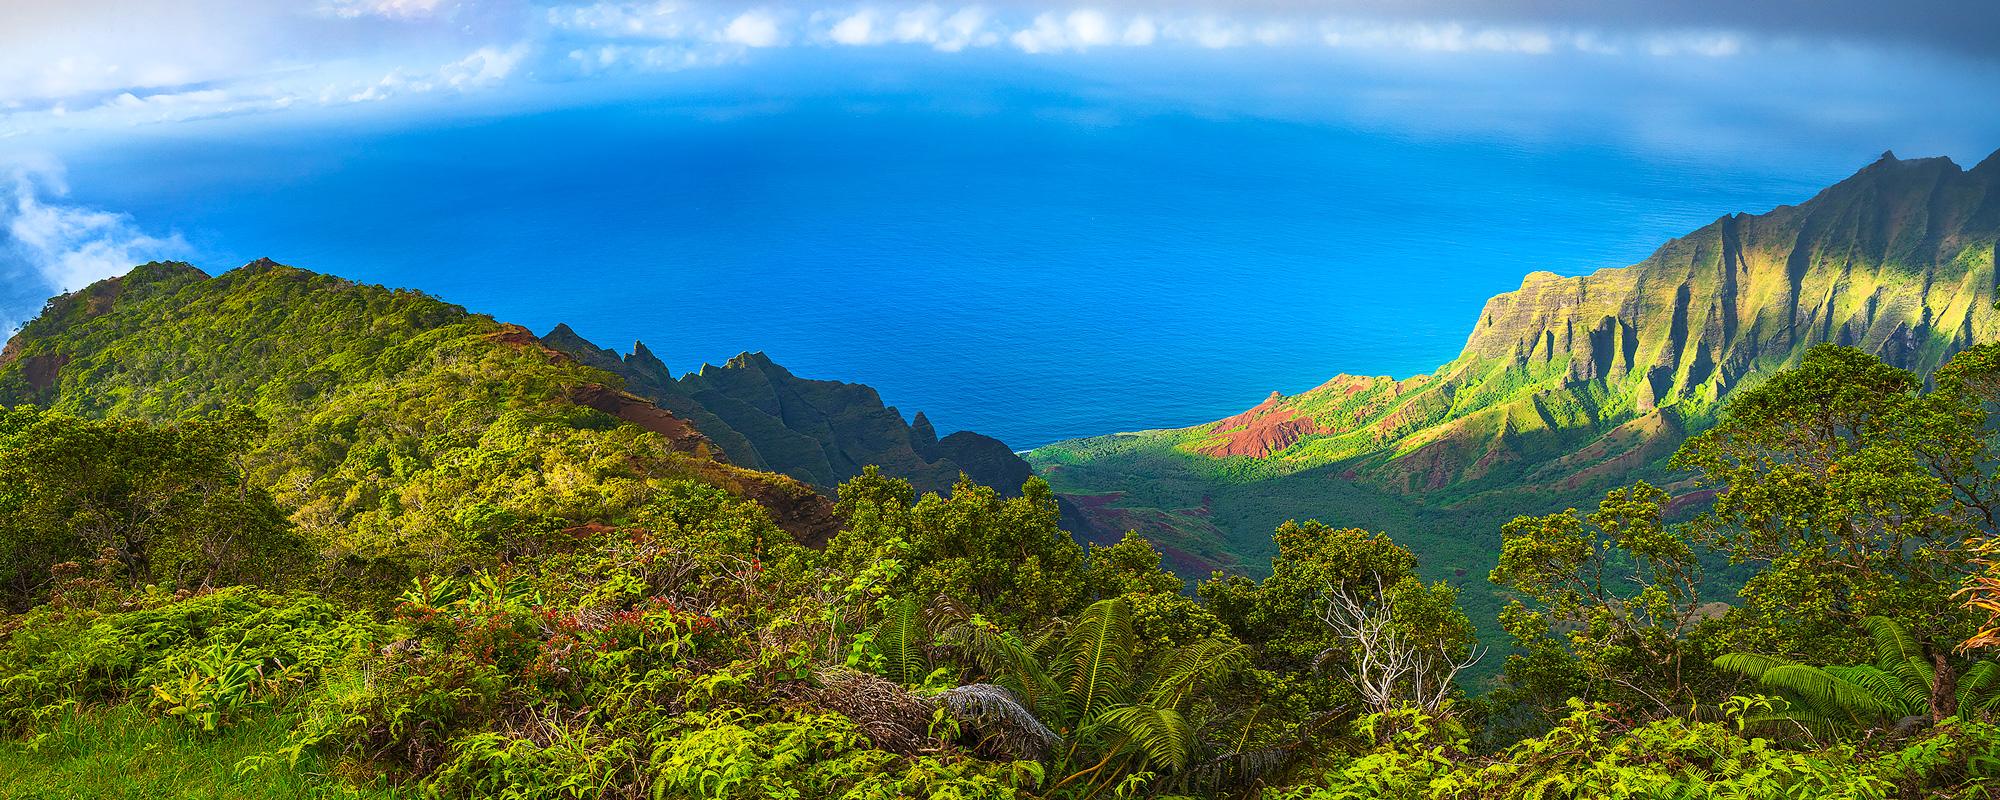 Kalalau Lookout,Kauai,Hawaii,Napali,sunset, photo